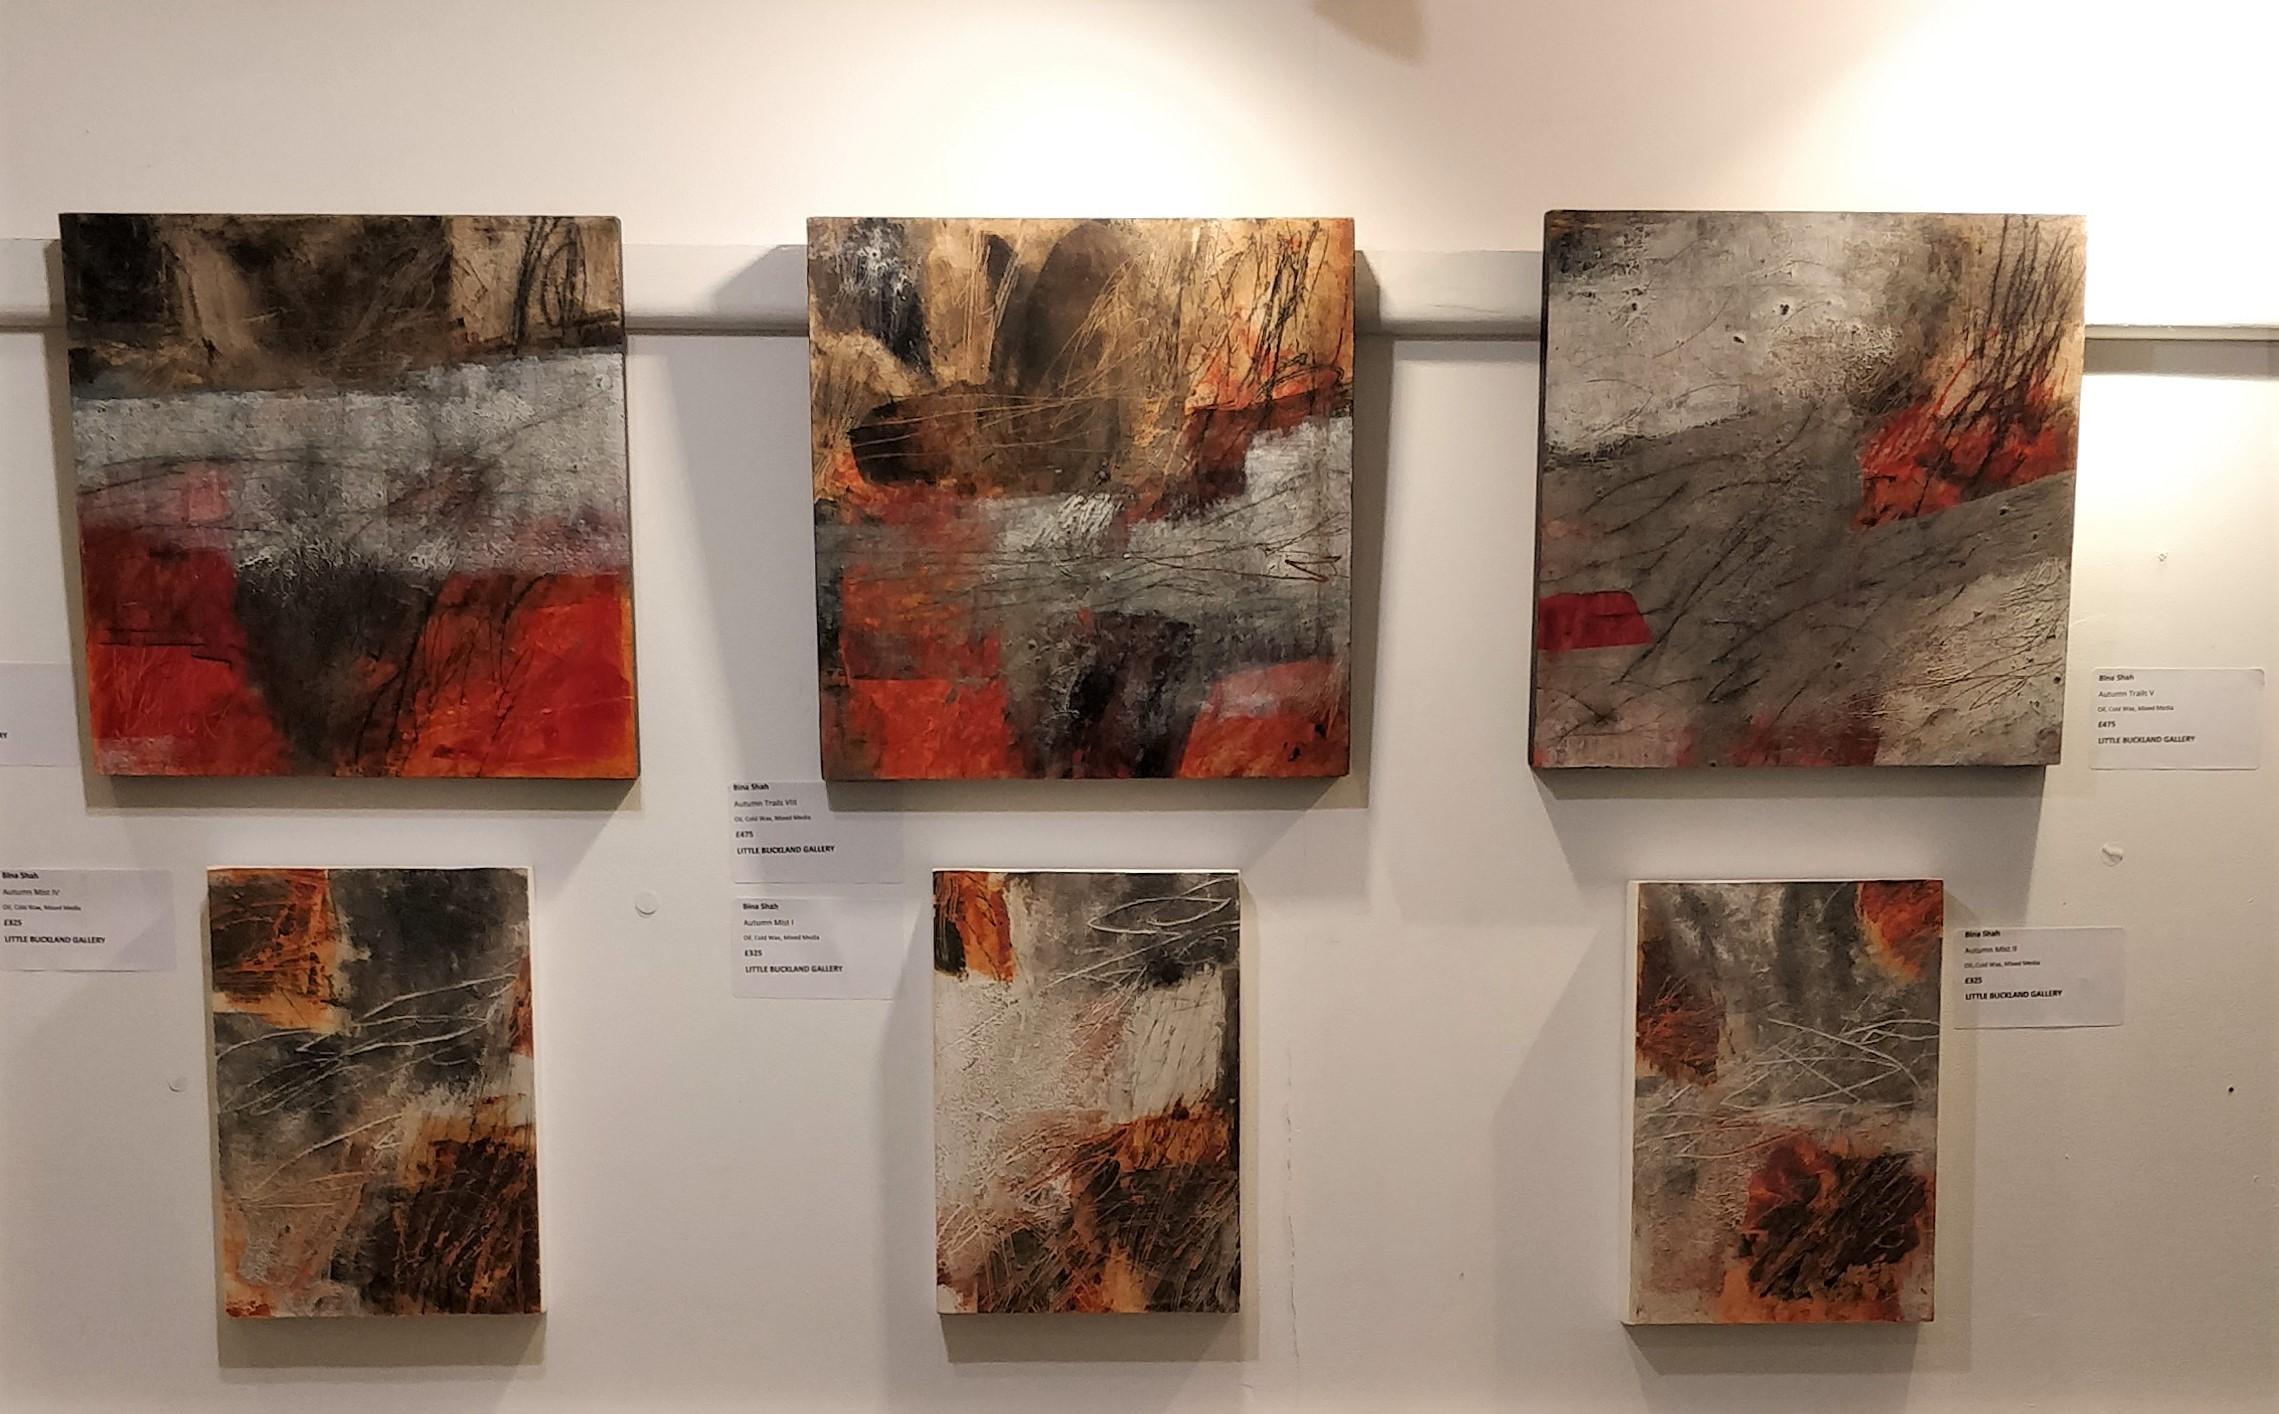 Equinox Exhibition Art Gallery Cotswolds. Little Buckland Gallery